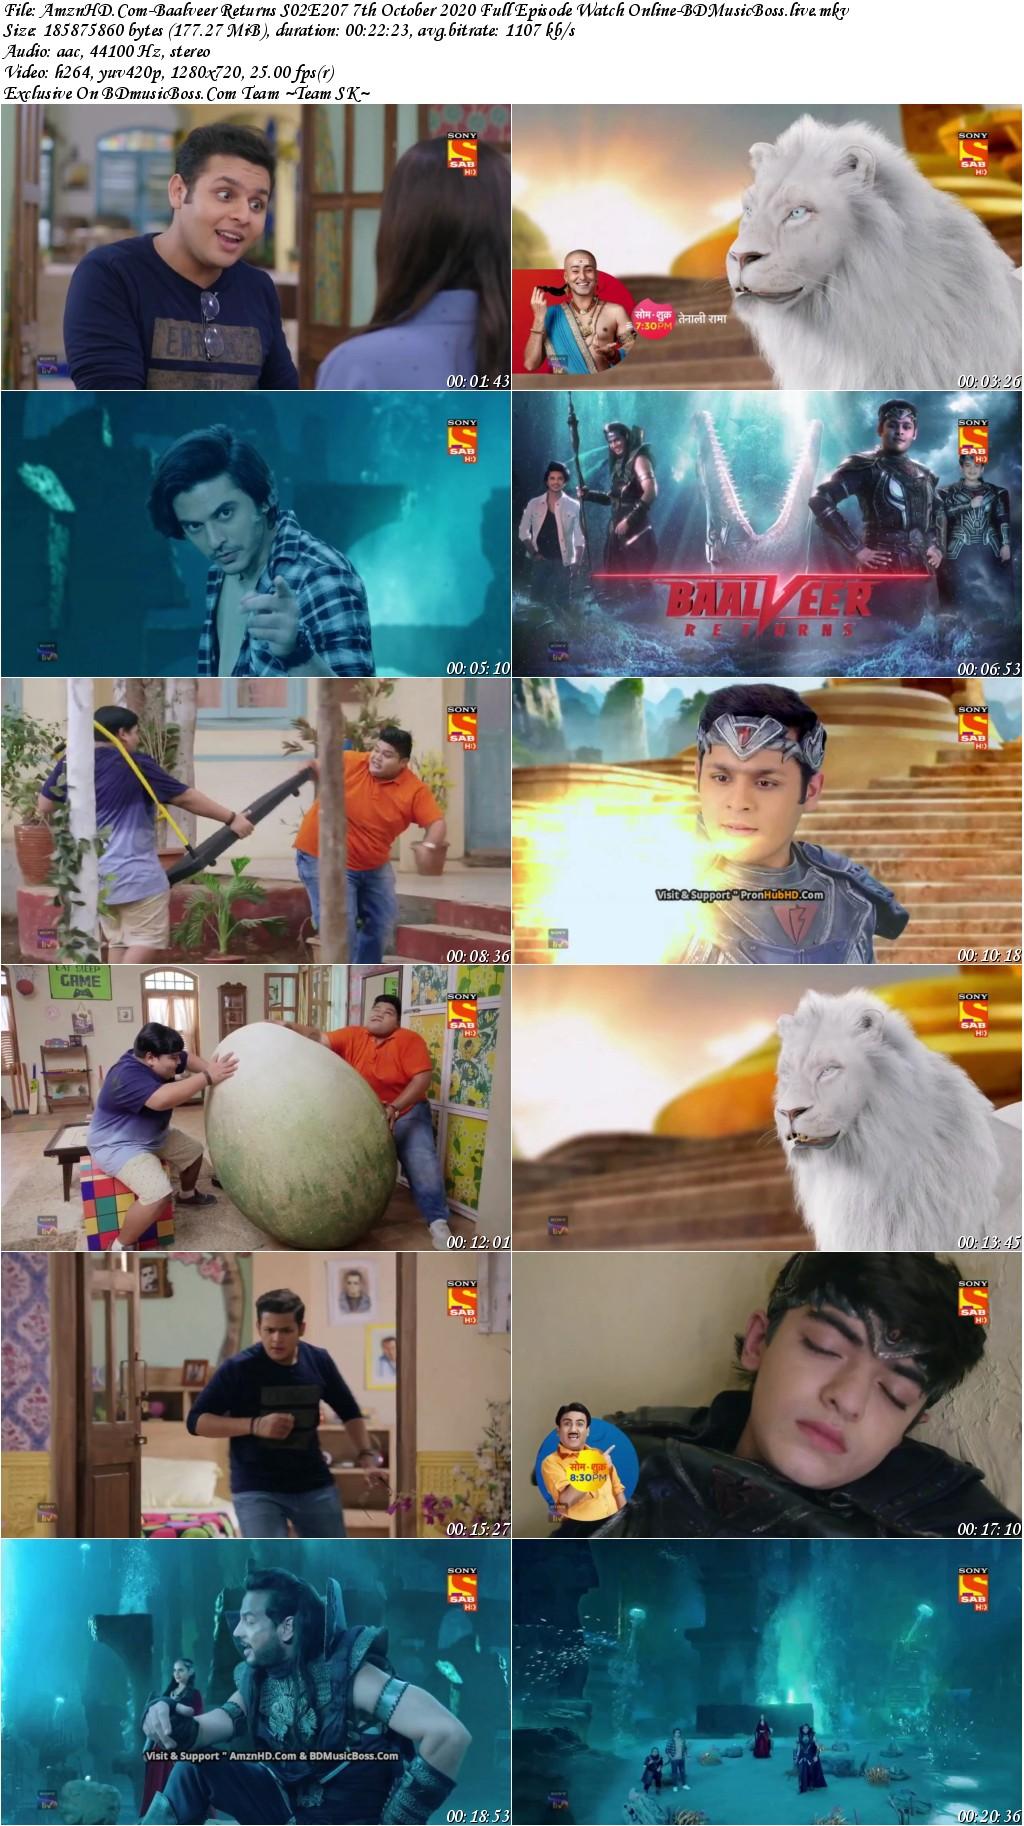 Amzn-HD-Com-Baalveer-Returns-S02-E207-7th-October-2020-Full-Episode-Watch-Online-BDMusic-Boss-live-s